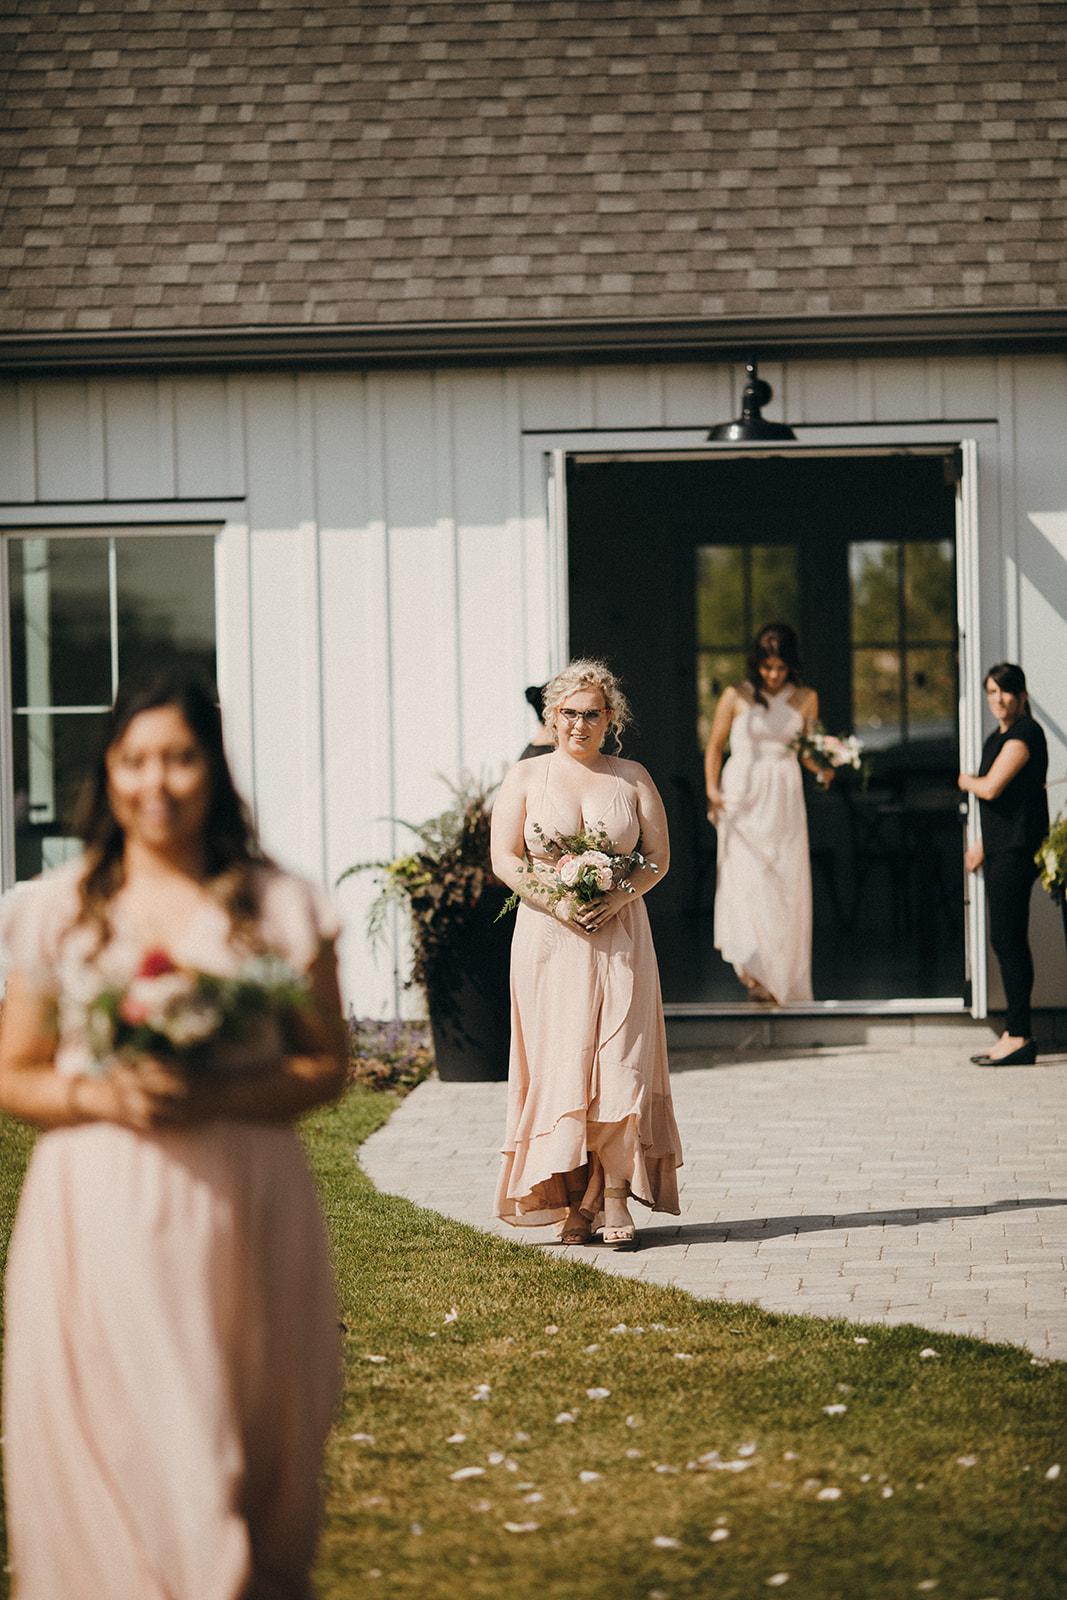 kaden_justine_wedding_3461.jpg